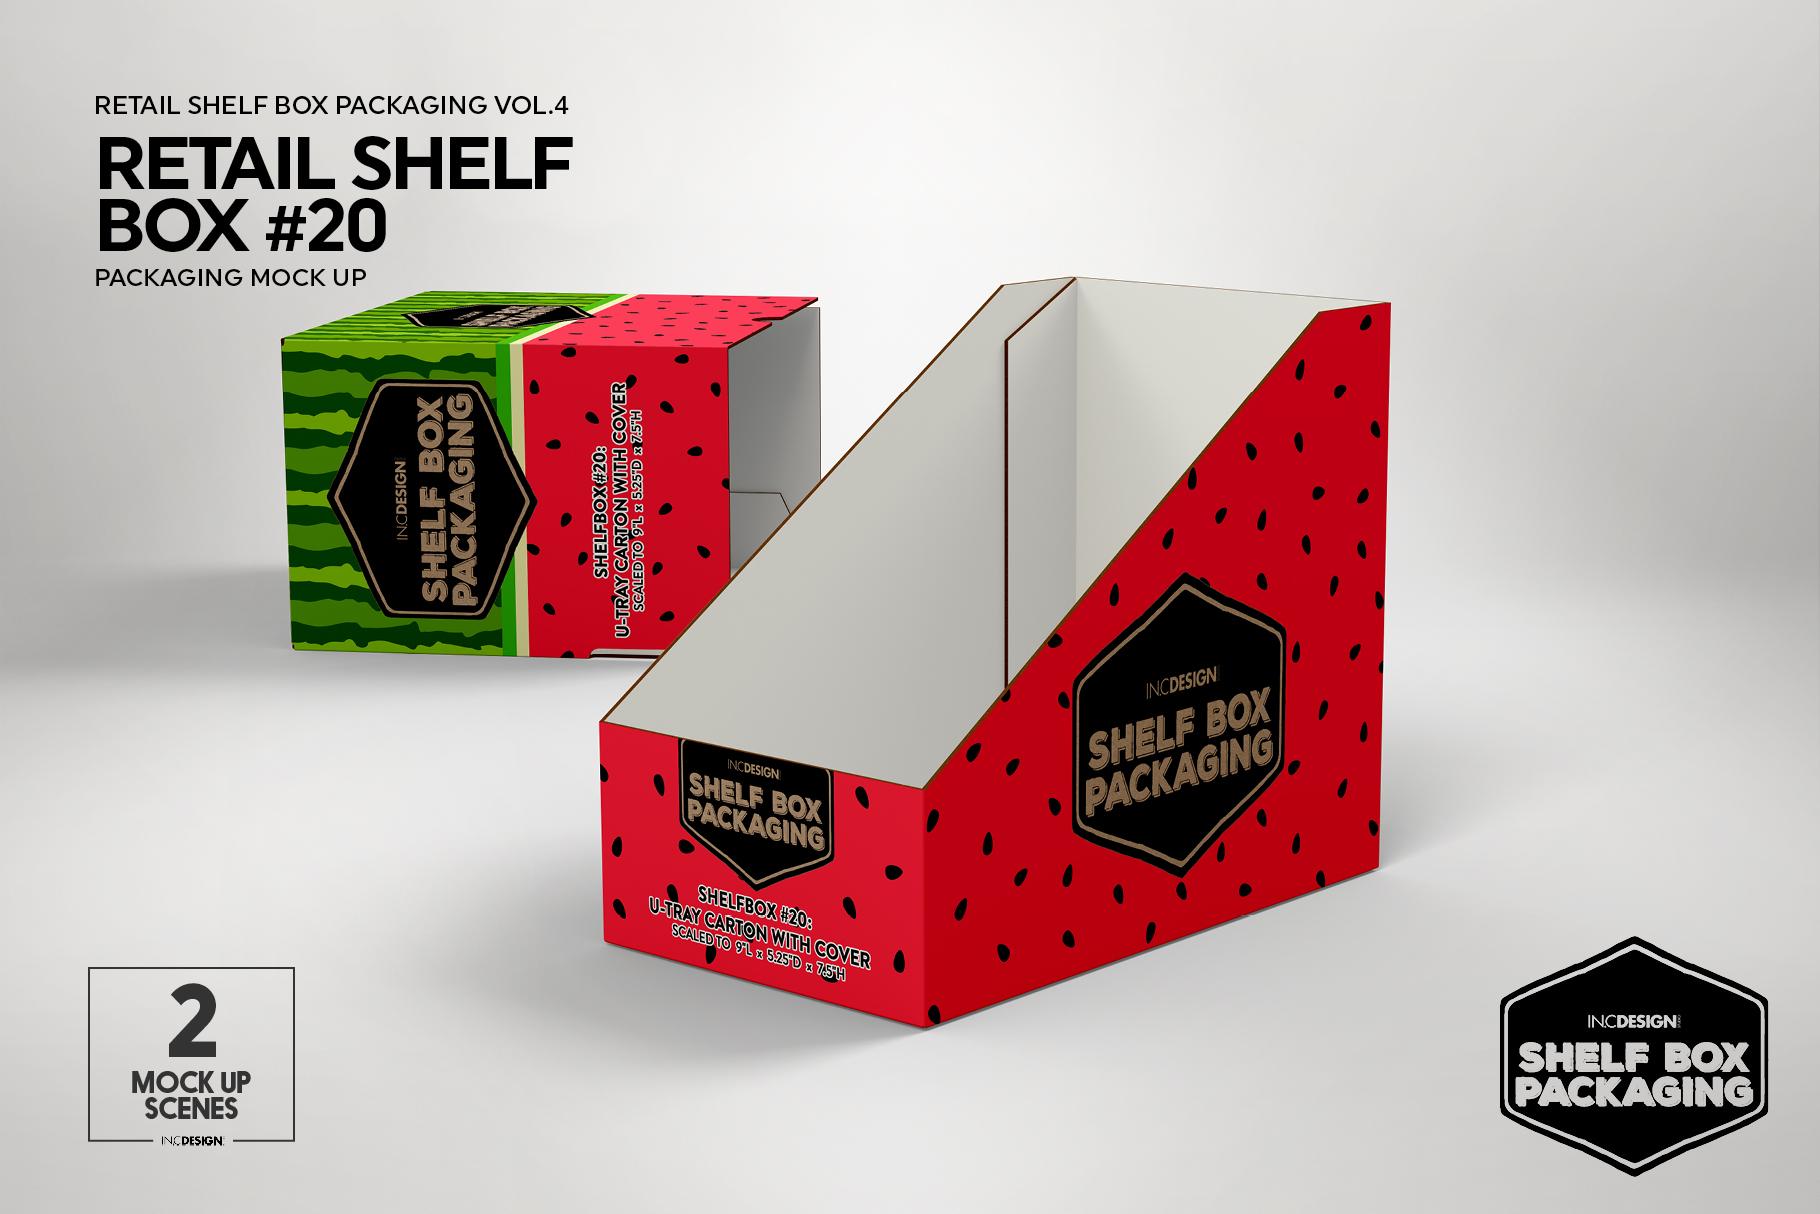 Retail Shelf Box 20 Packaging Mockup example image 5